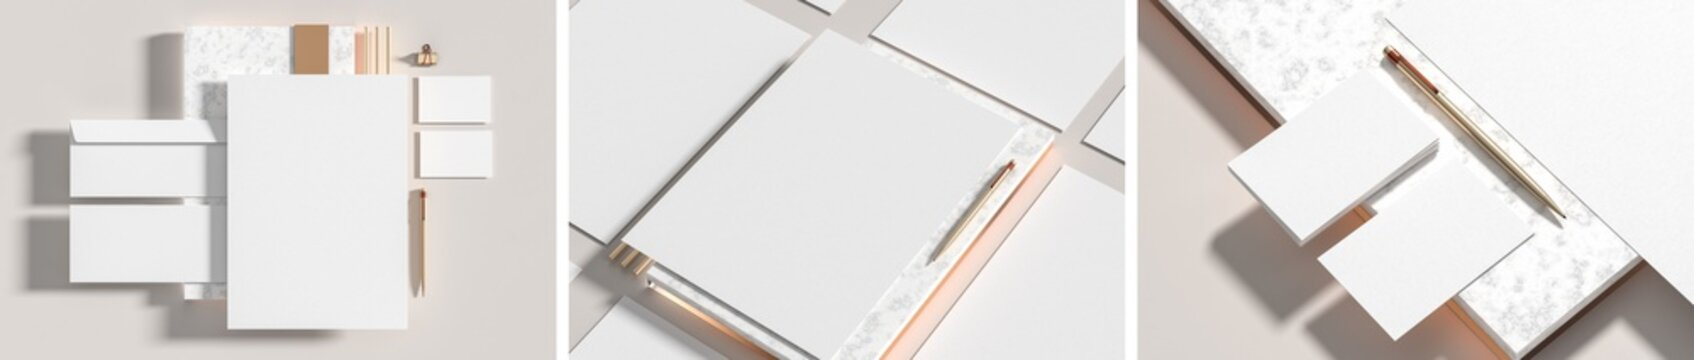 Corporate identity stationery mock up isolated on white marbel background. Mock up for branding identity. 3D illustration